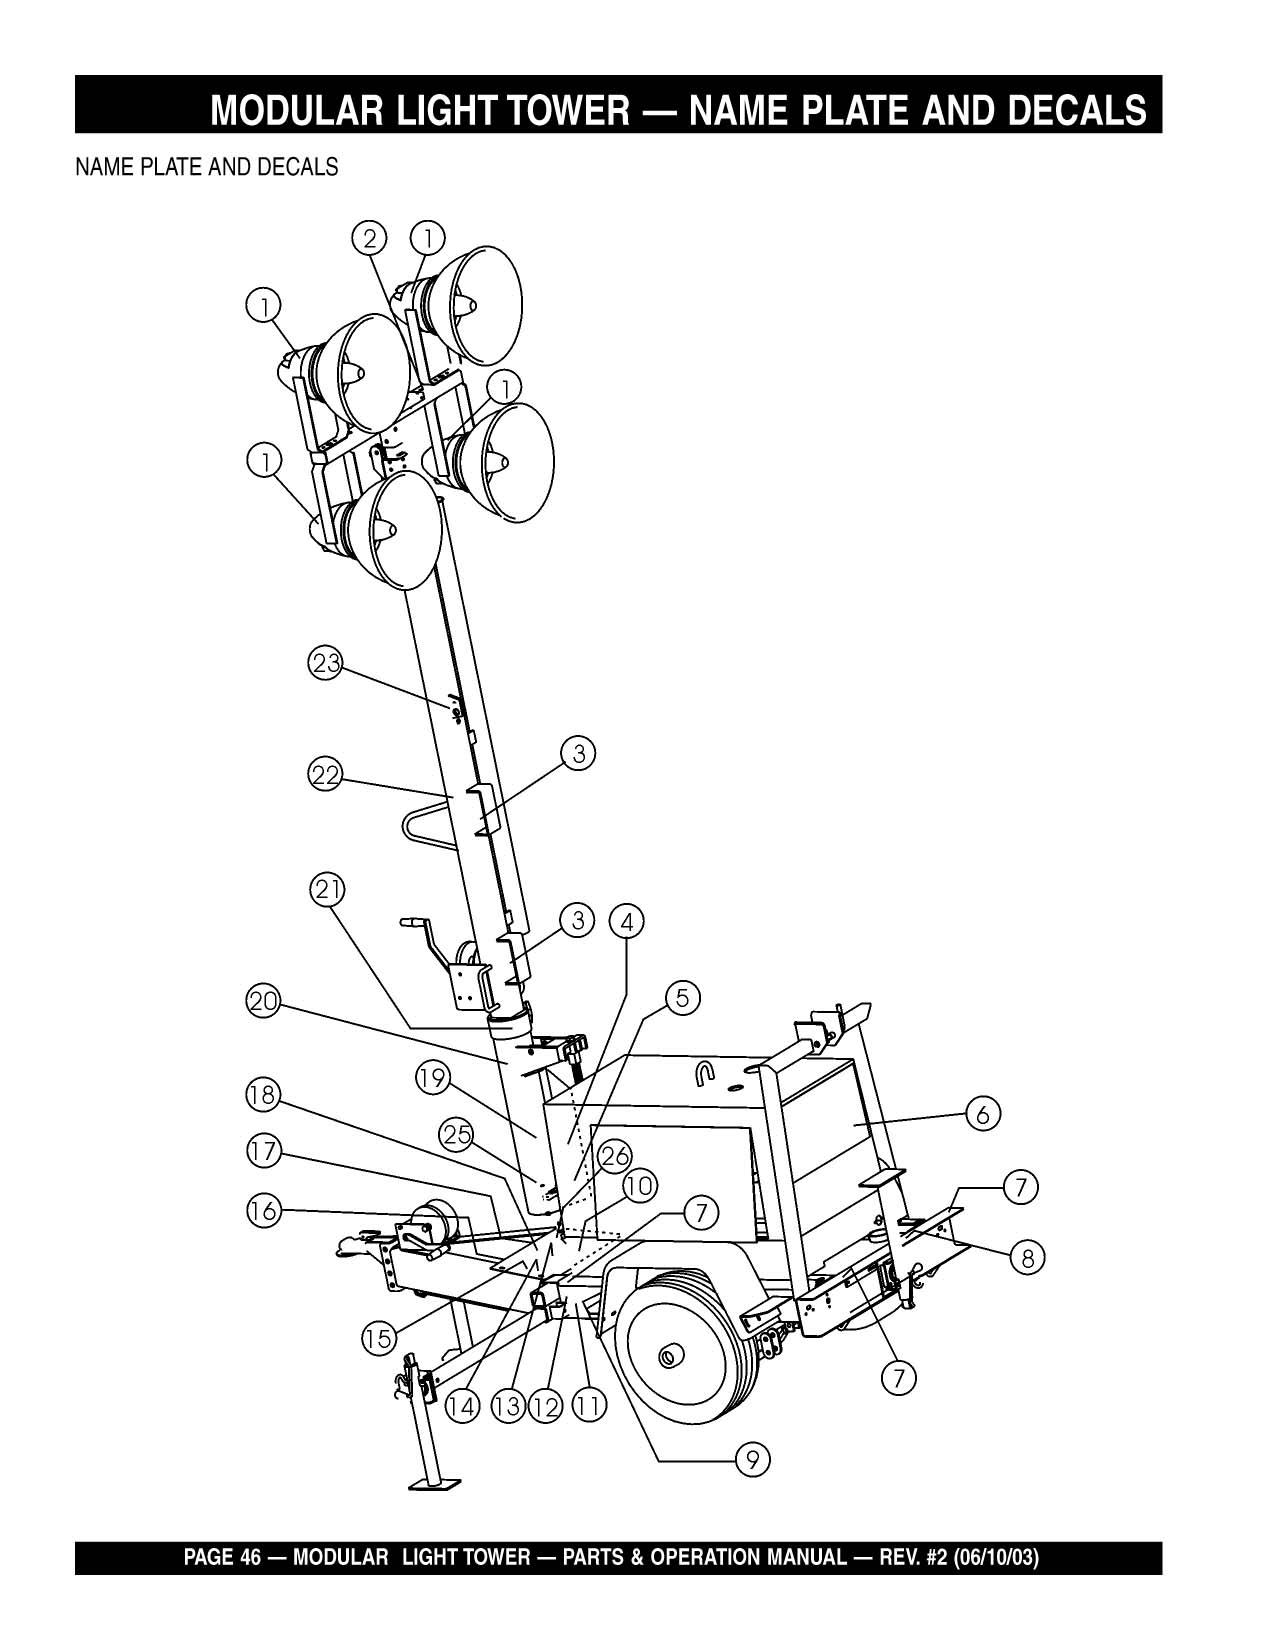 Construction Light Parts : Construction equipment parts jlg from gciron